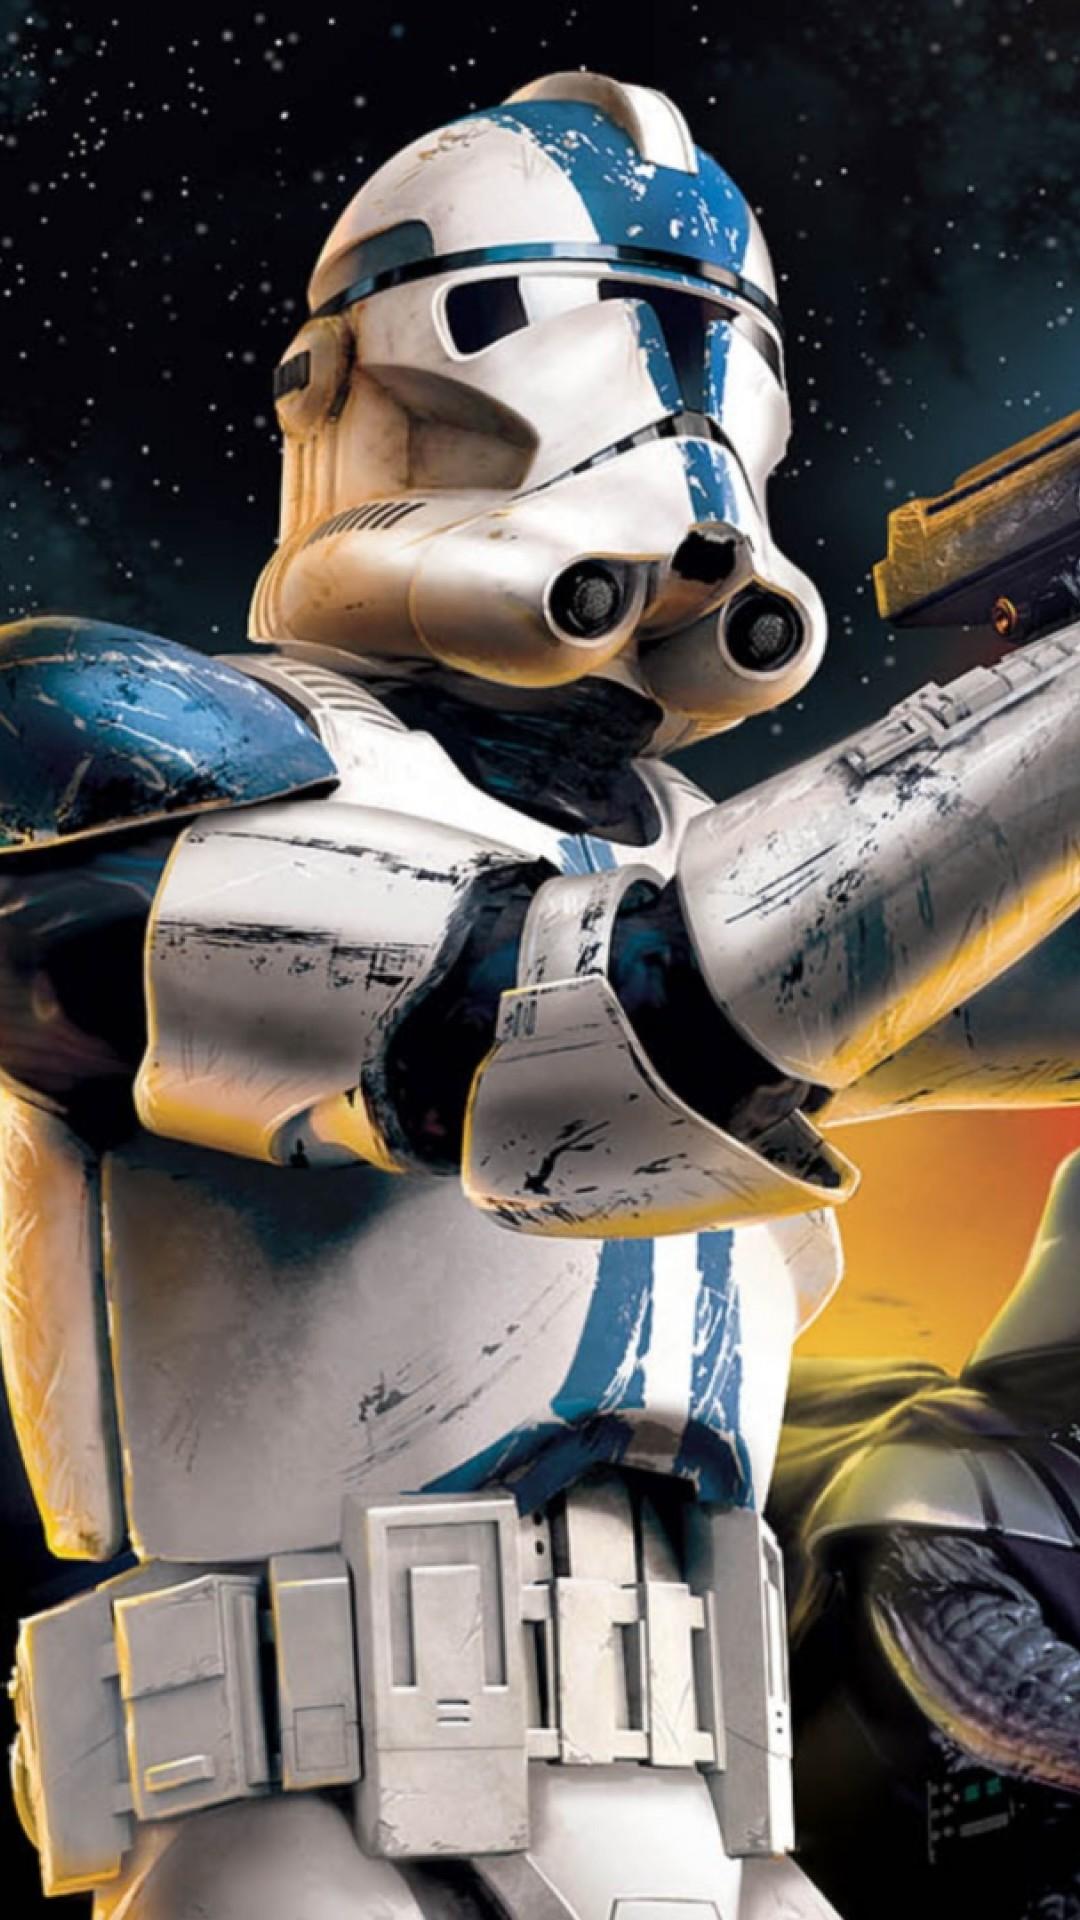 Free Photos Star Wars Iphone Wallpaper Star Wars Battlefront 2 Original 1080x1920 Wallpaper Teahub Io